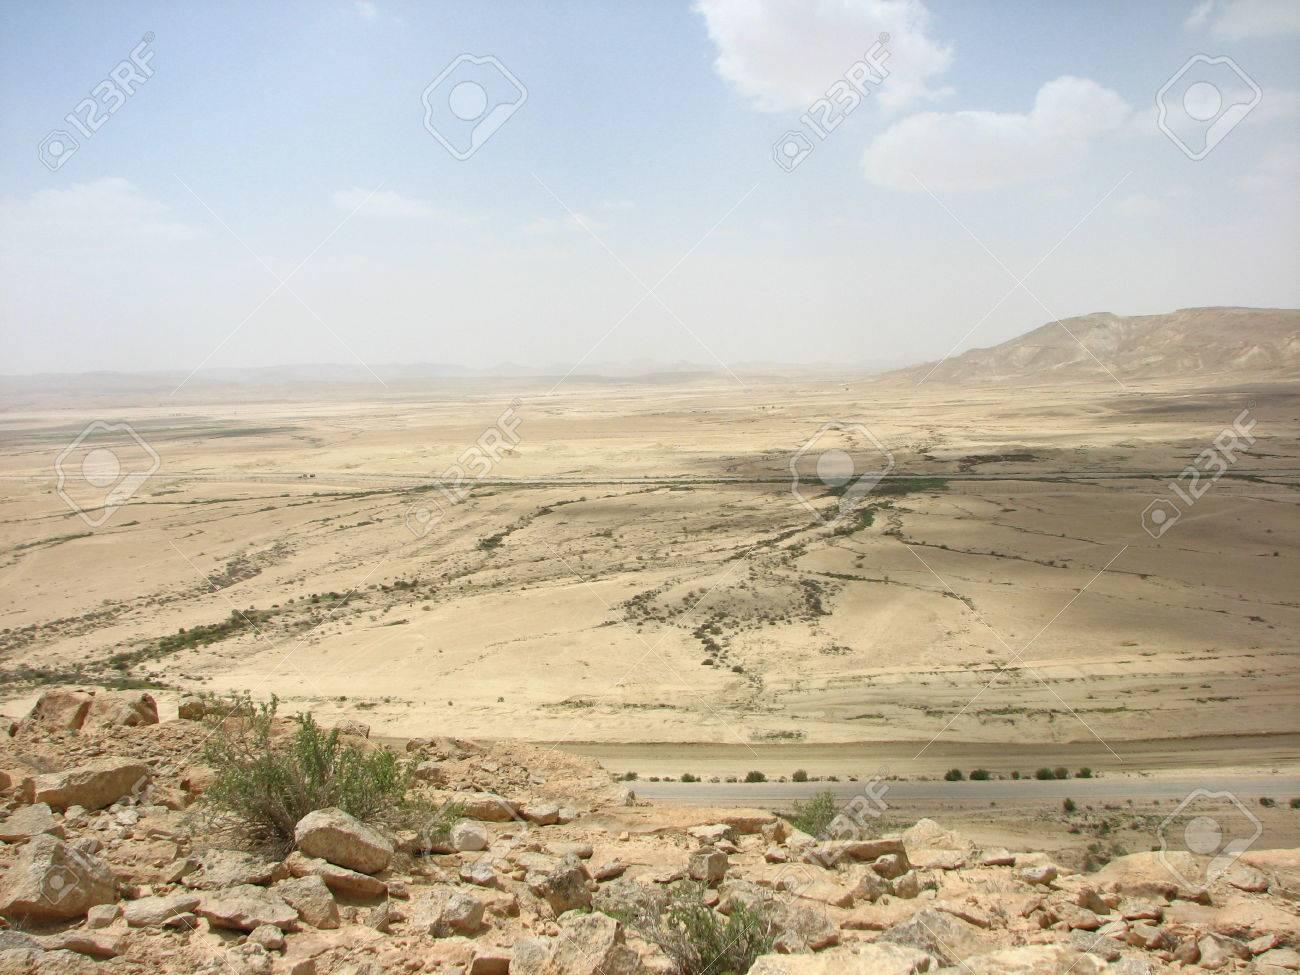 Egyptian Sinai Peninsula on the border of Israel